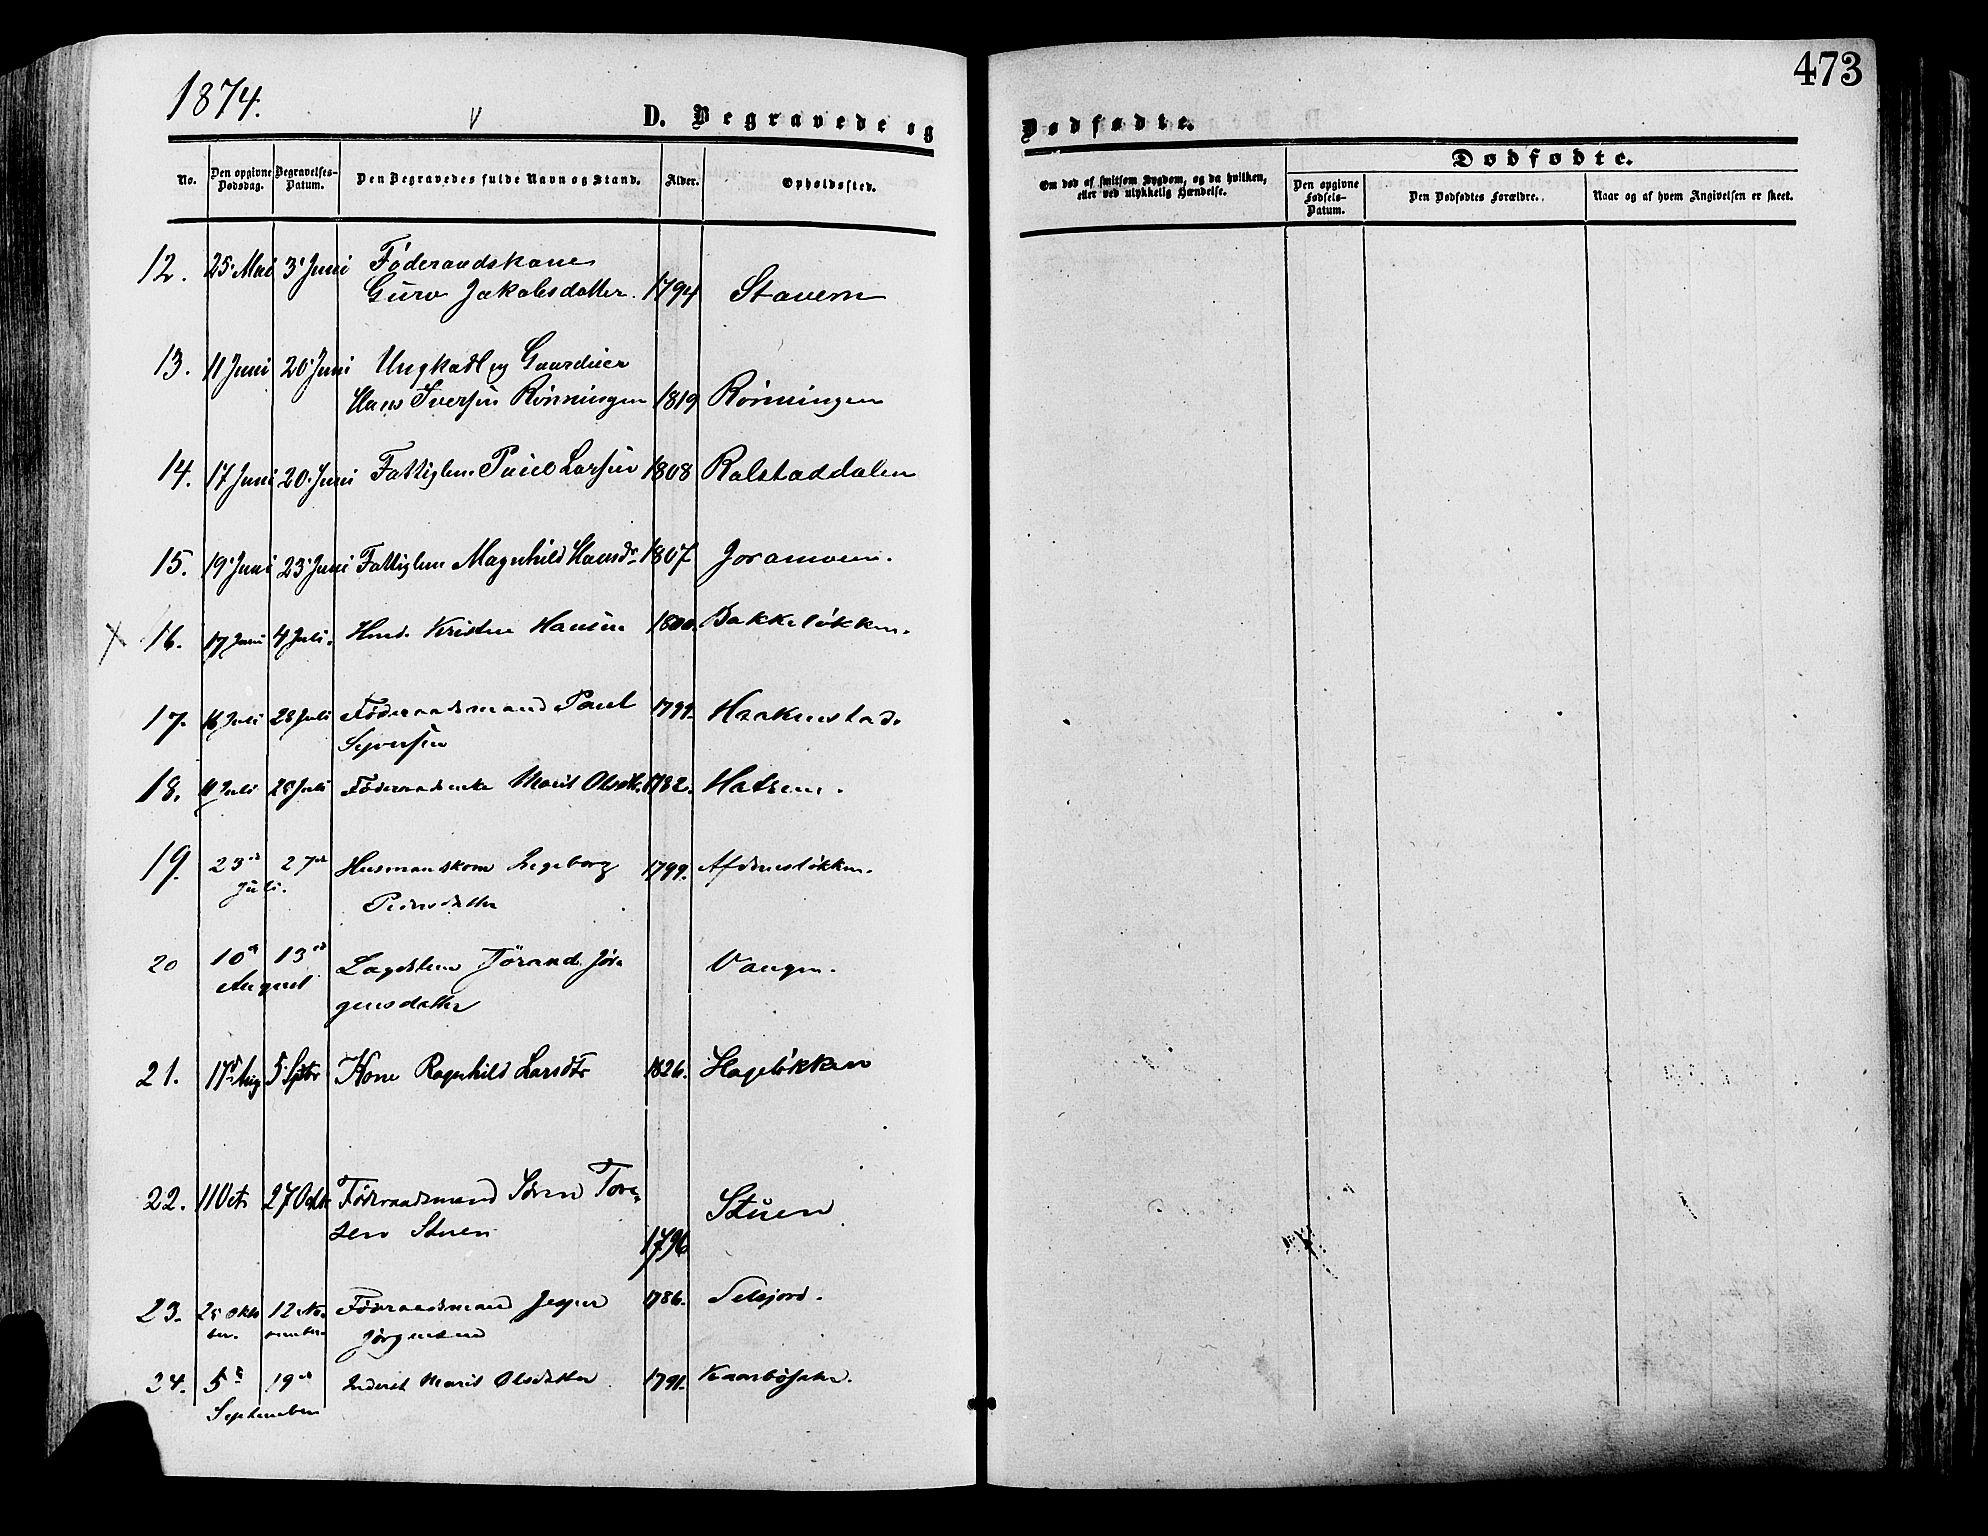 SAH, Lesja prestekontor, Ministerialbok nr. 8, 1854-1880, s. 473